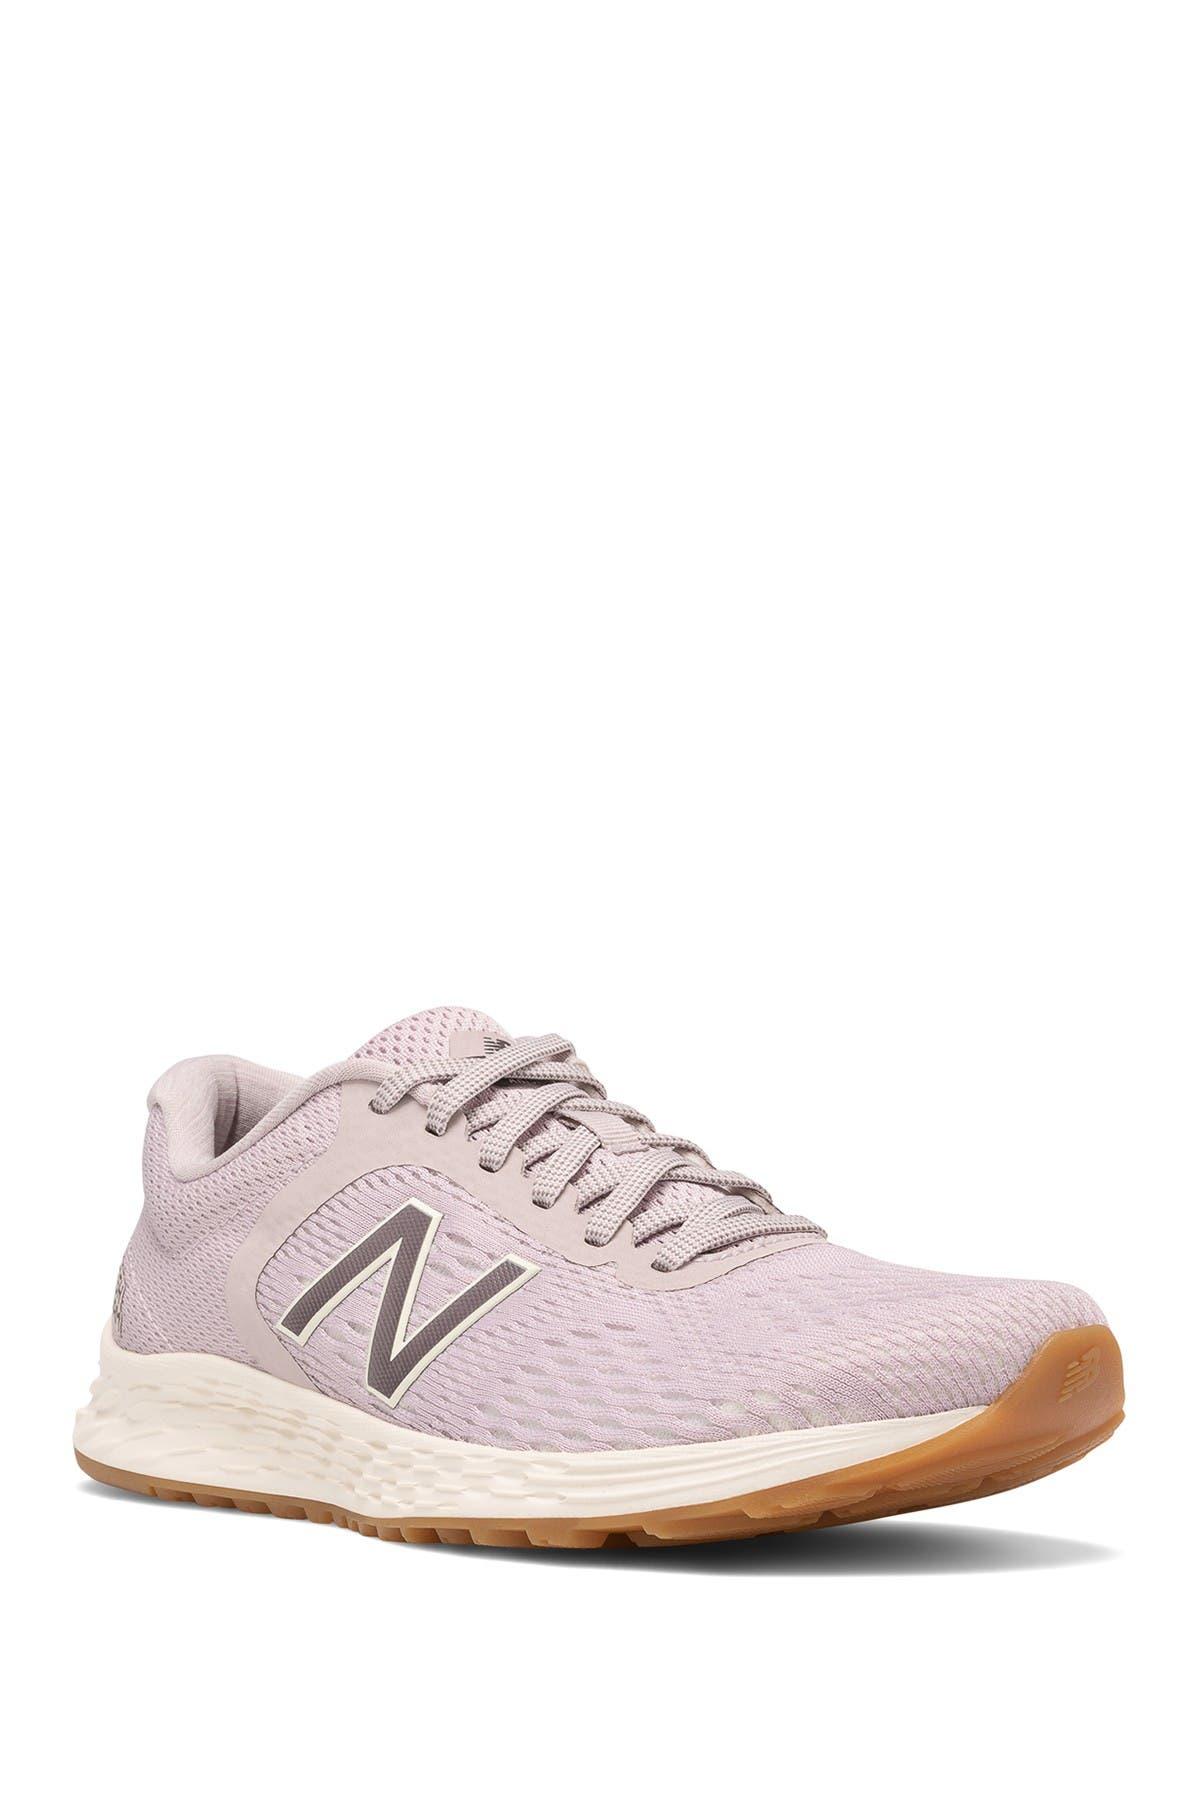 Image of New Balance Fresh Foam Arishi V2 Running Sneaker - Wide Width Available